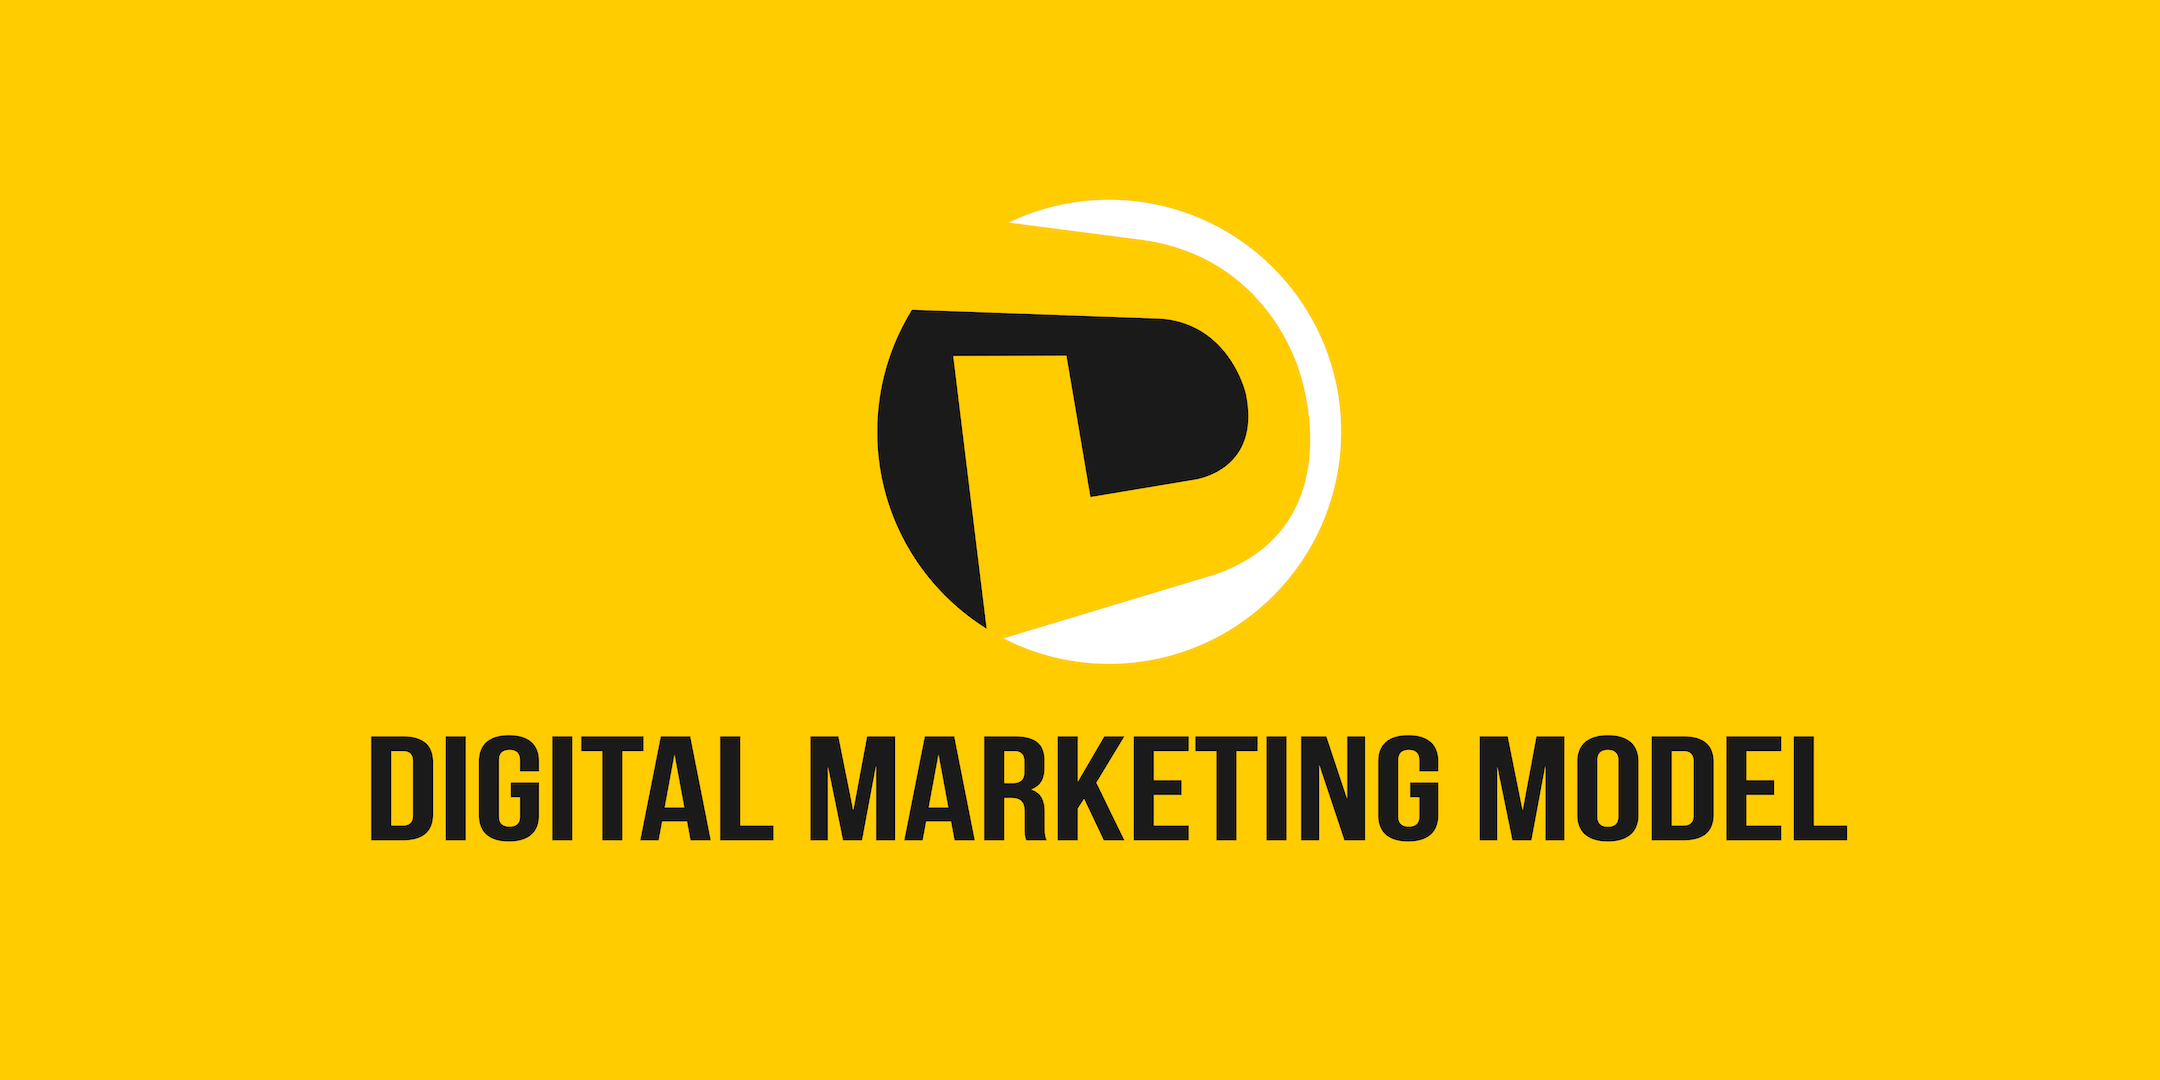 Digital Marketing Model [Napoli]